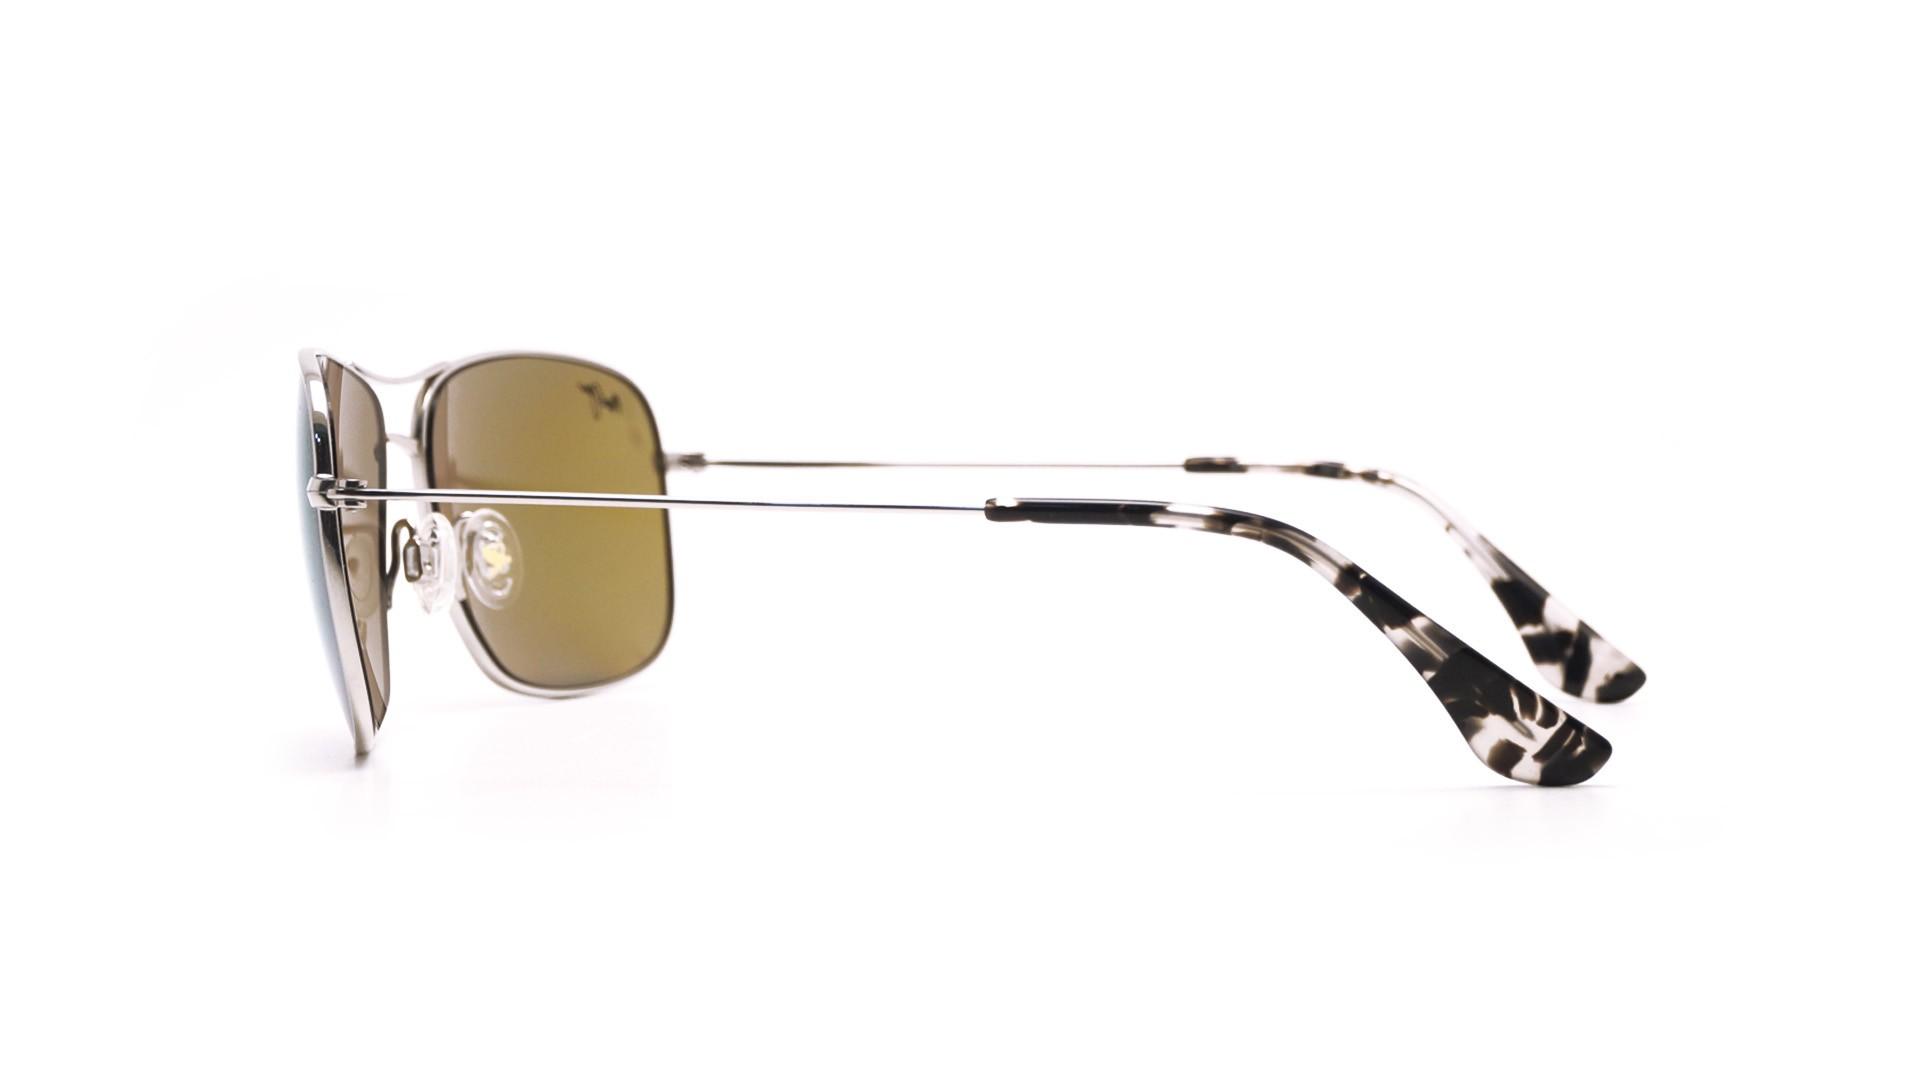 f9550e650d Sunglasses Maui Jim Wiki Wiki Silver B246 17 59-17 Medium Polarized Flash